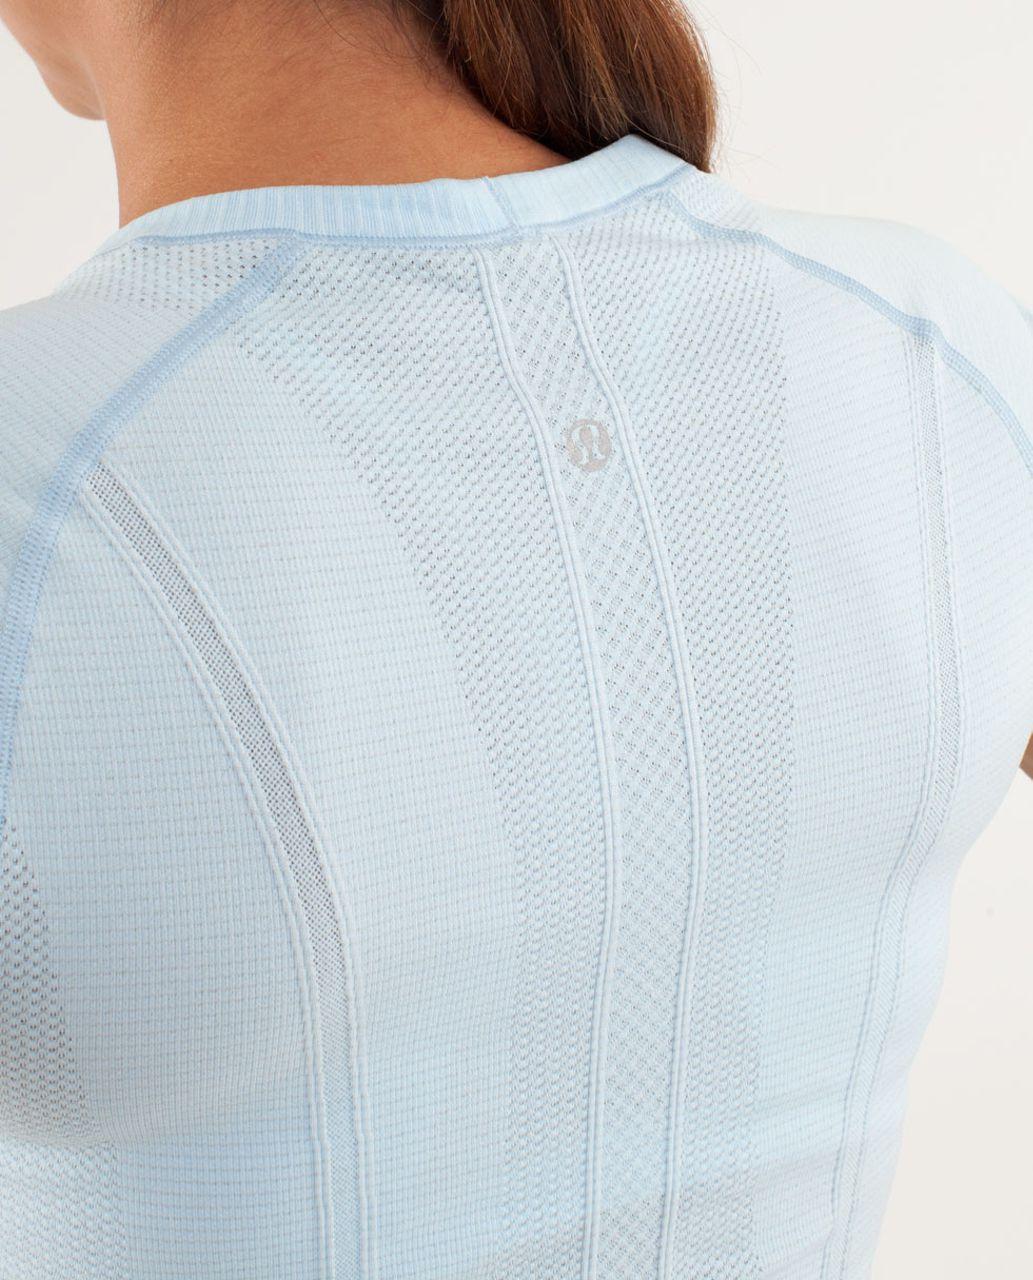 Lululemon Run:  Swiftly Tech Short Sleeve - Caspian Blue